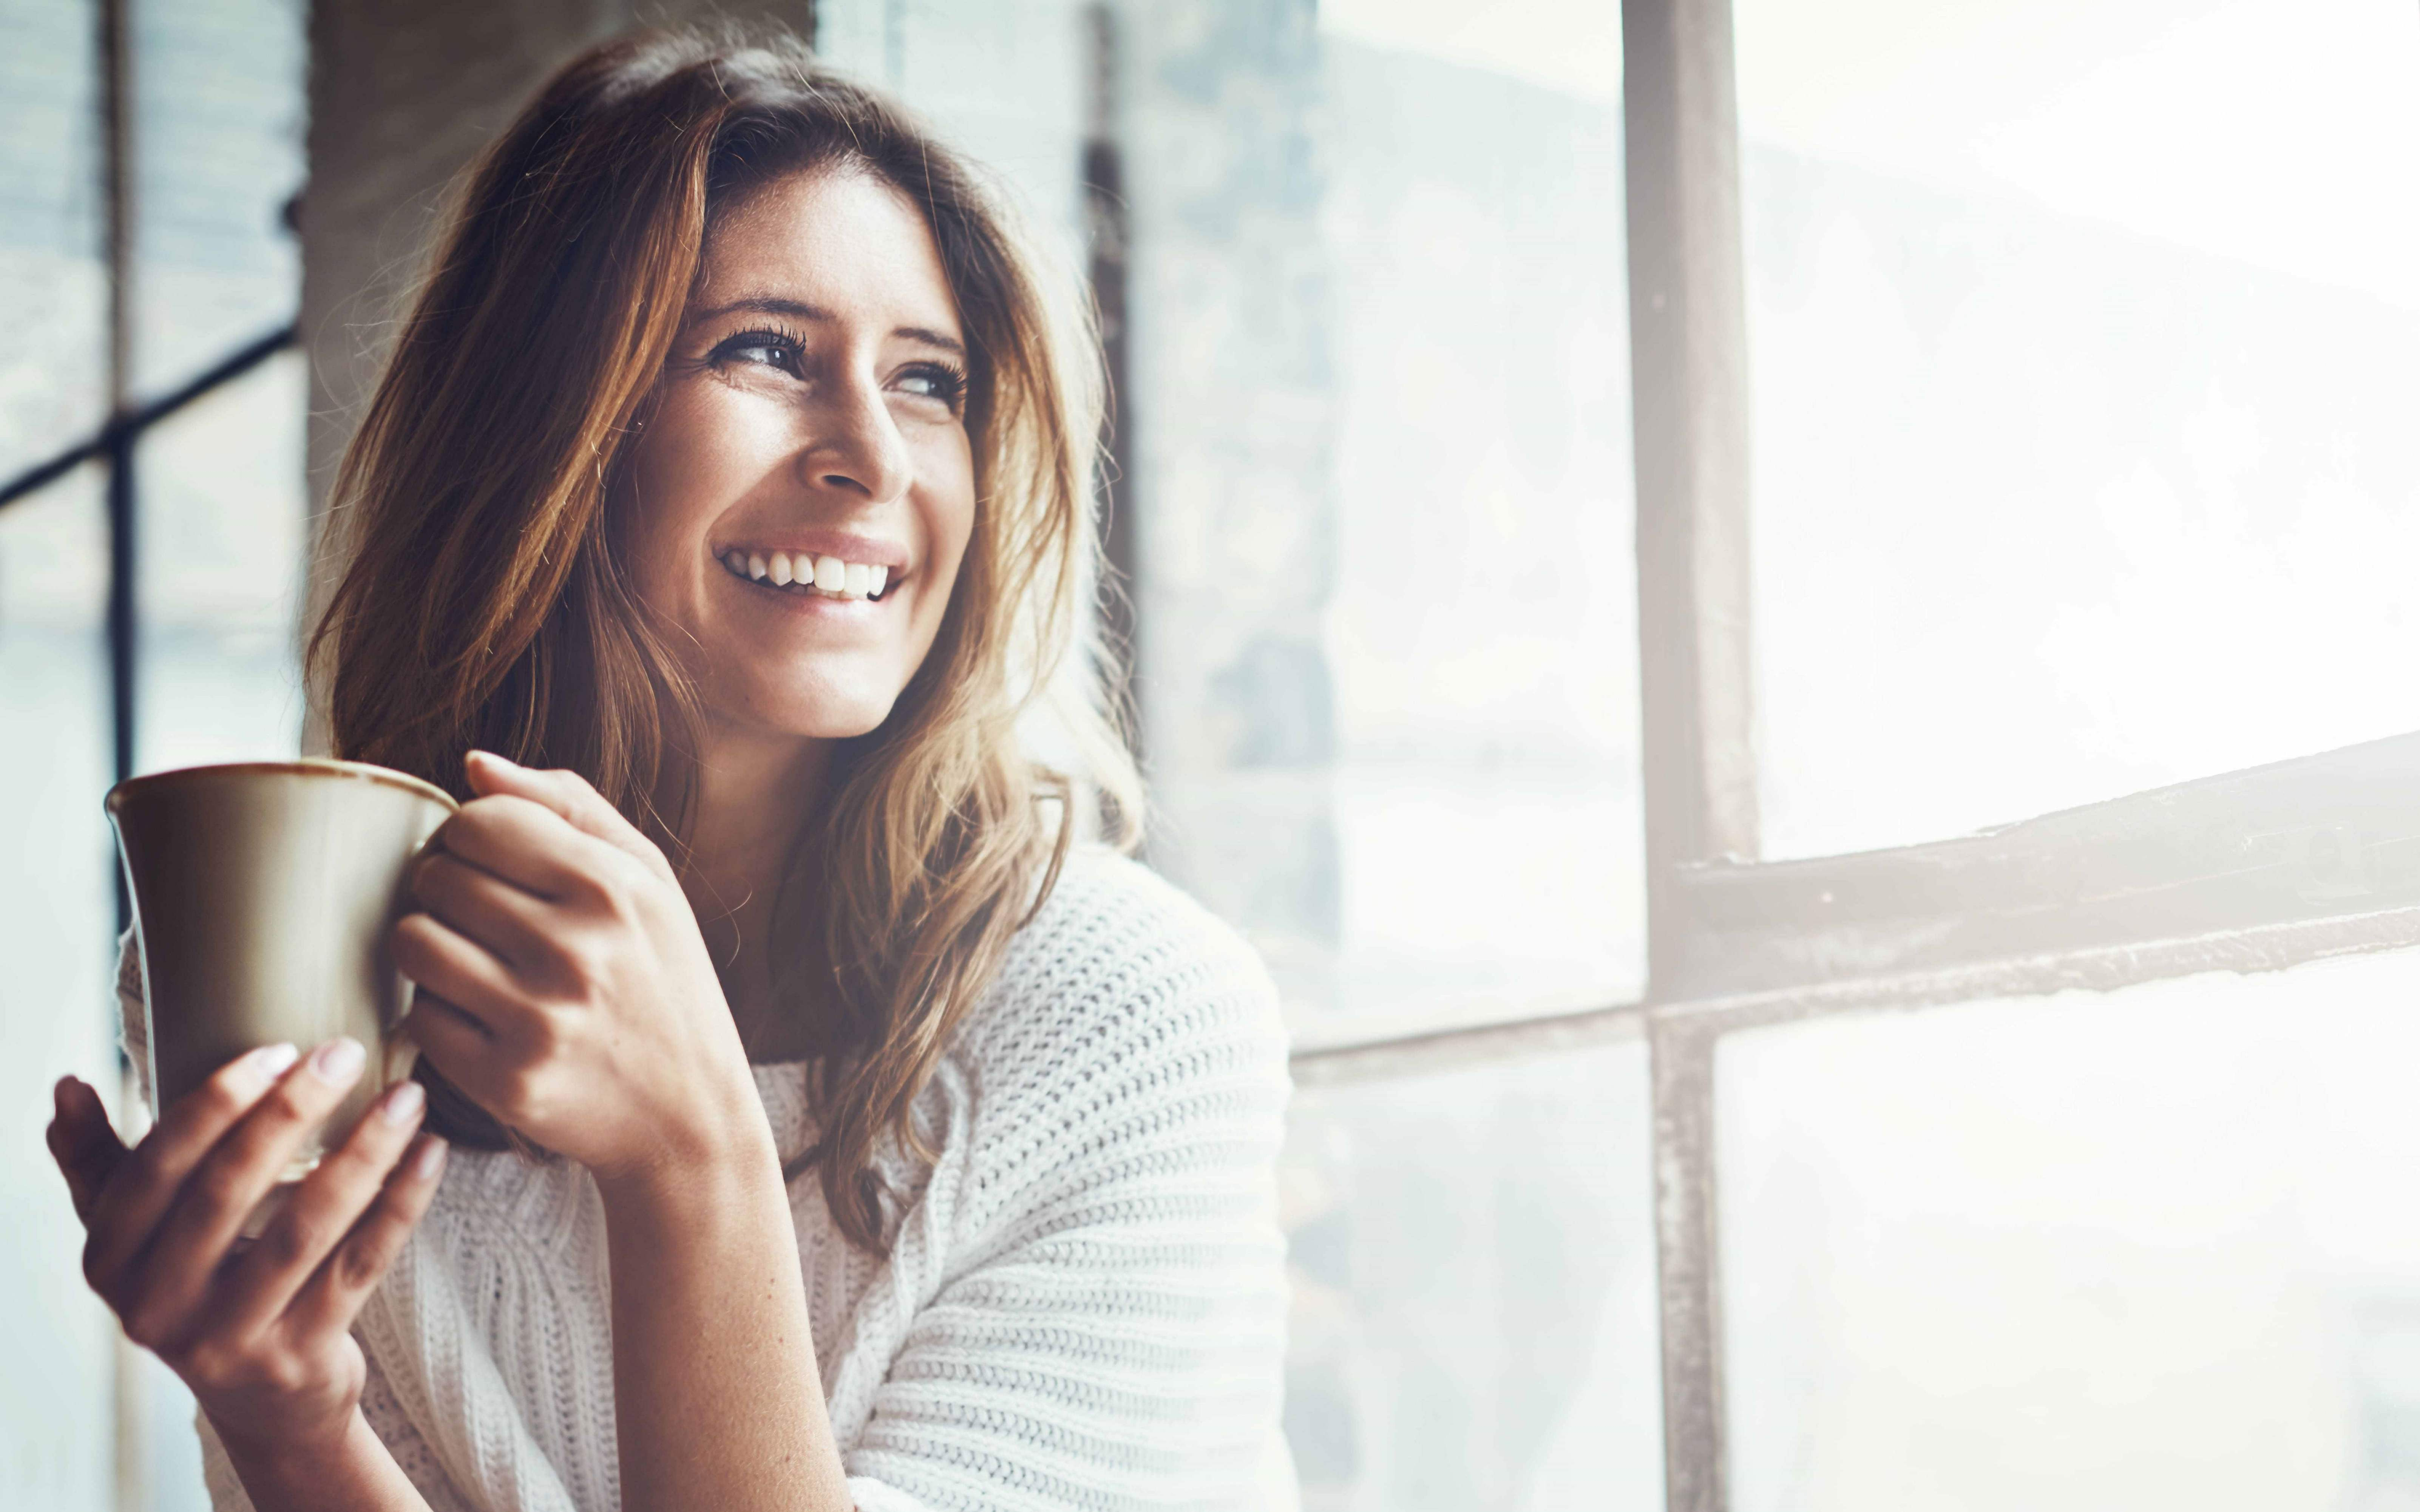 CBD Woman Smiling